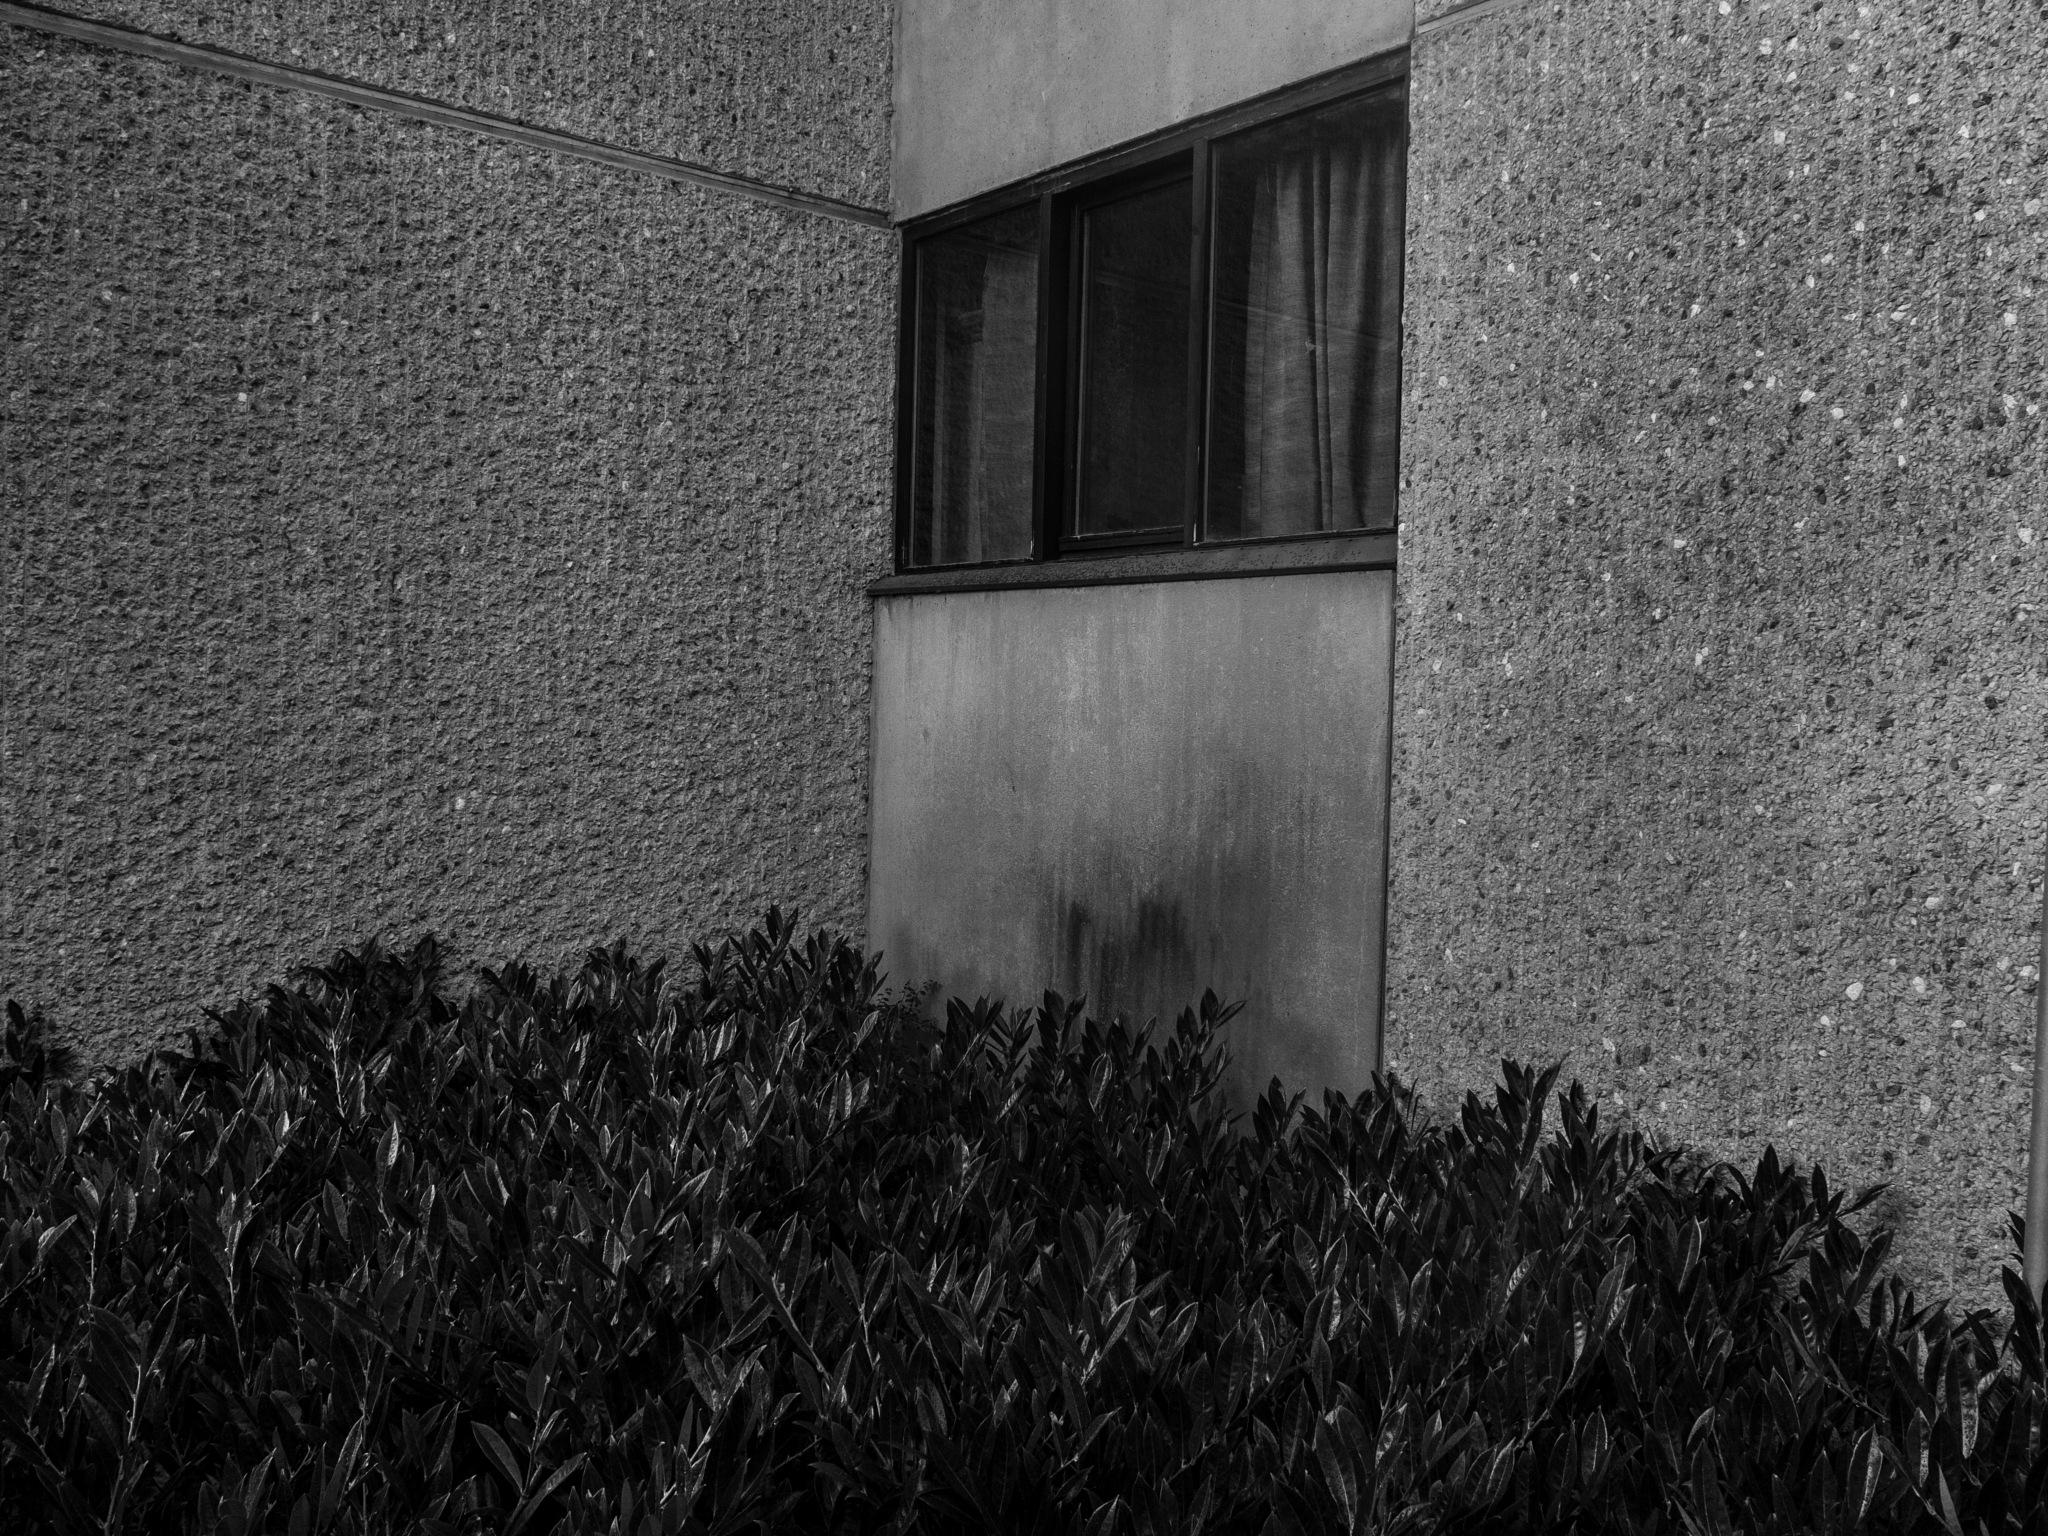 Window by lauraragnhof